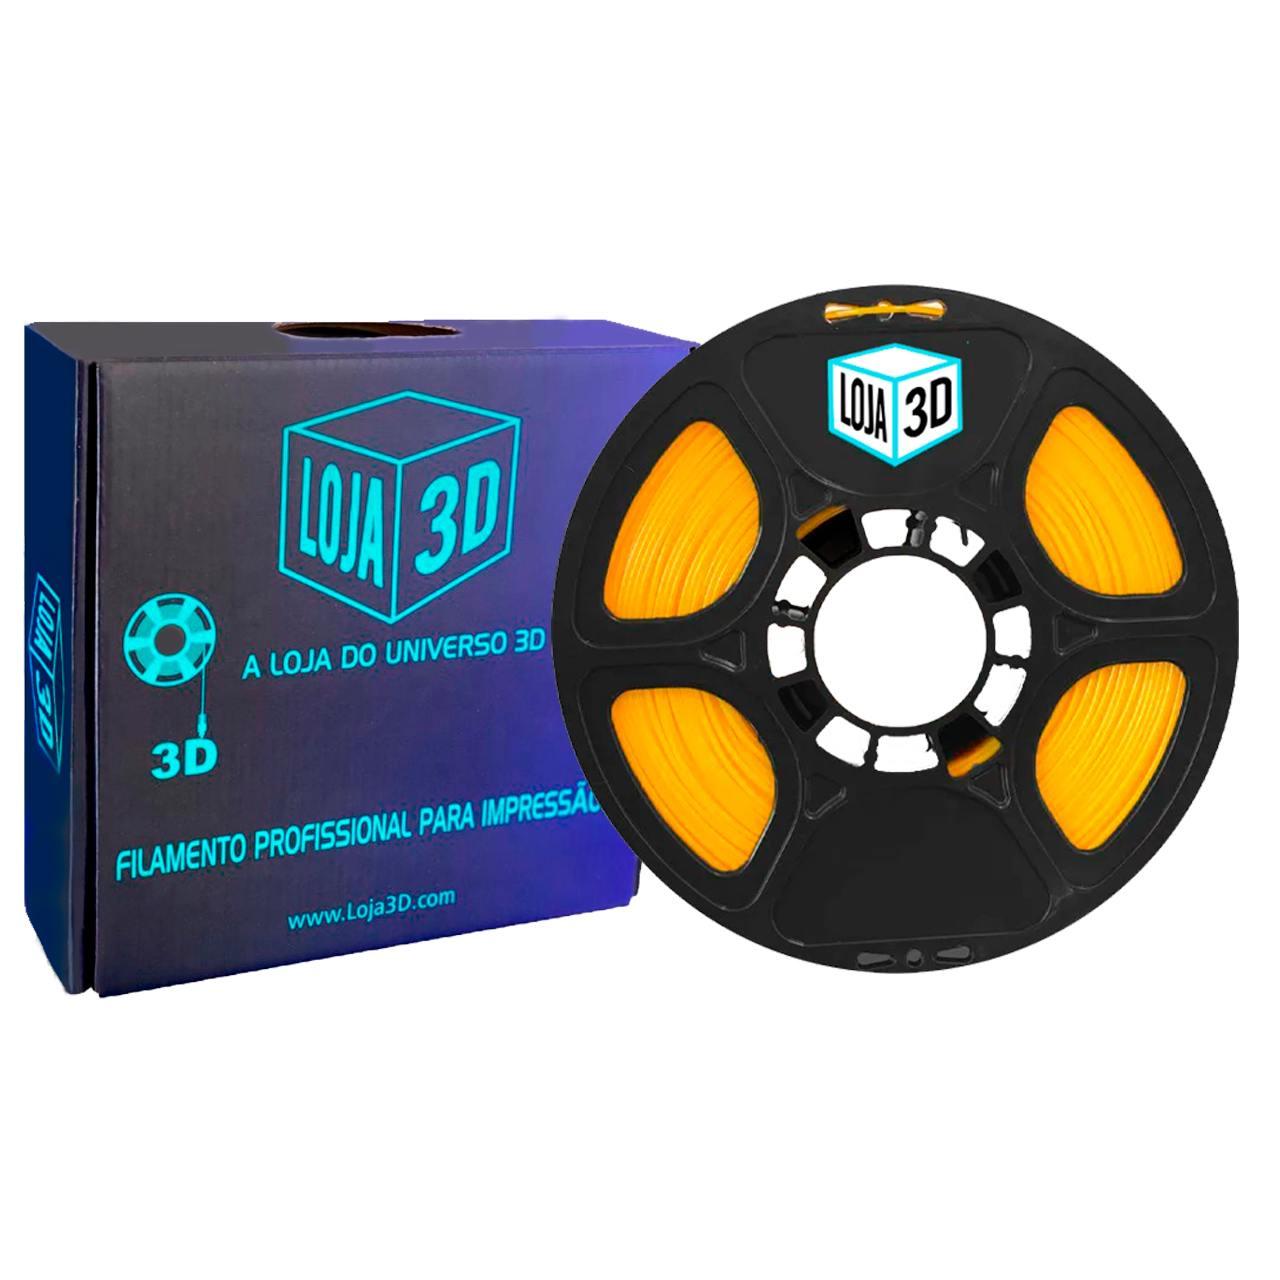 Filamento PET-G Pro - Amarelo - Loja 3D - 1.75mm - 1kg